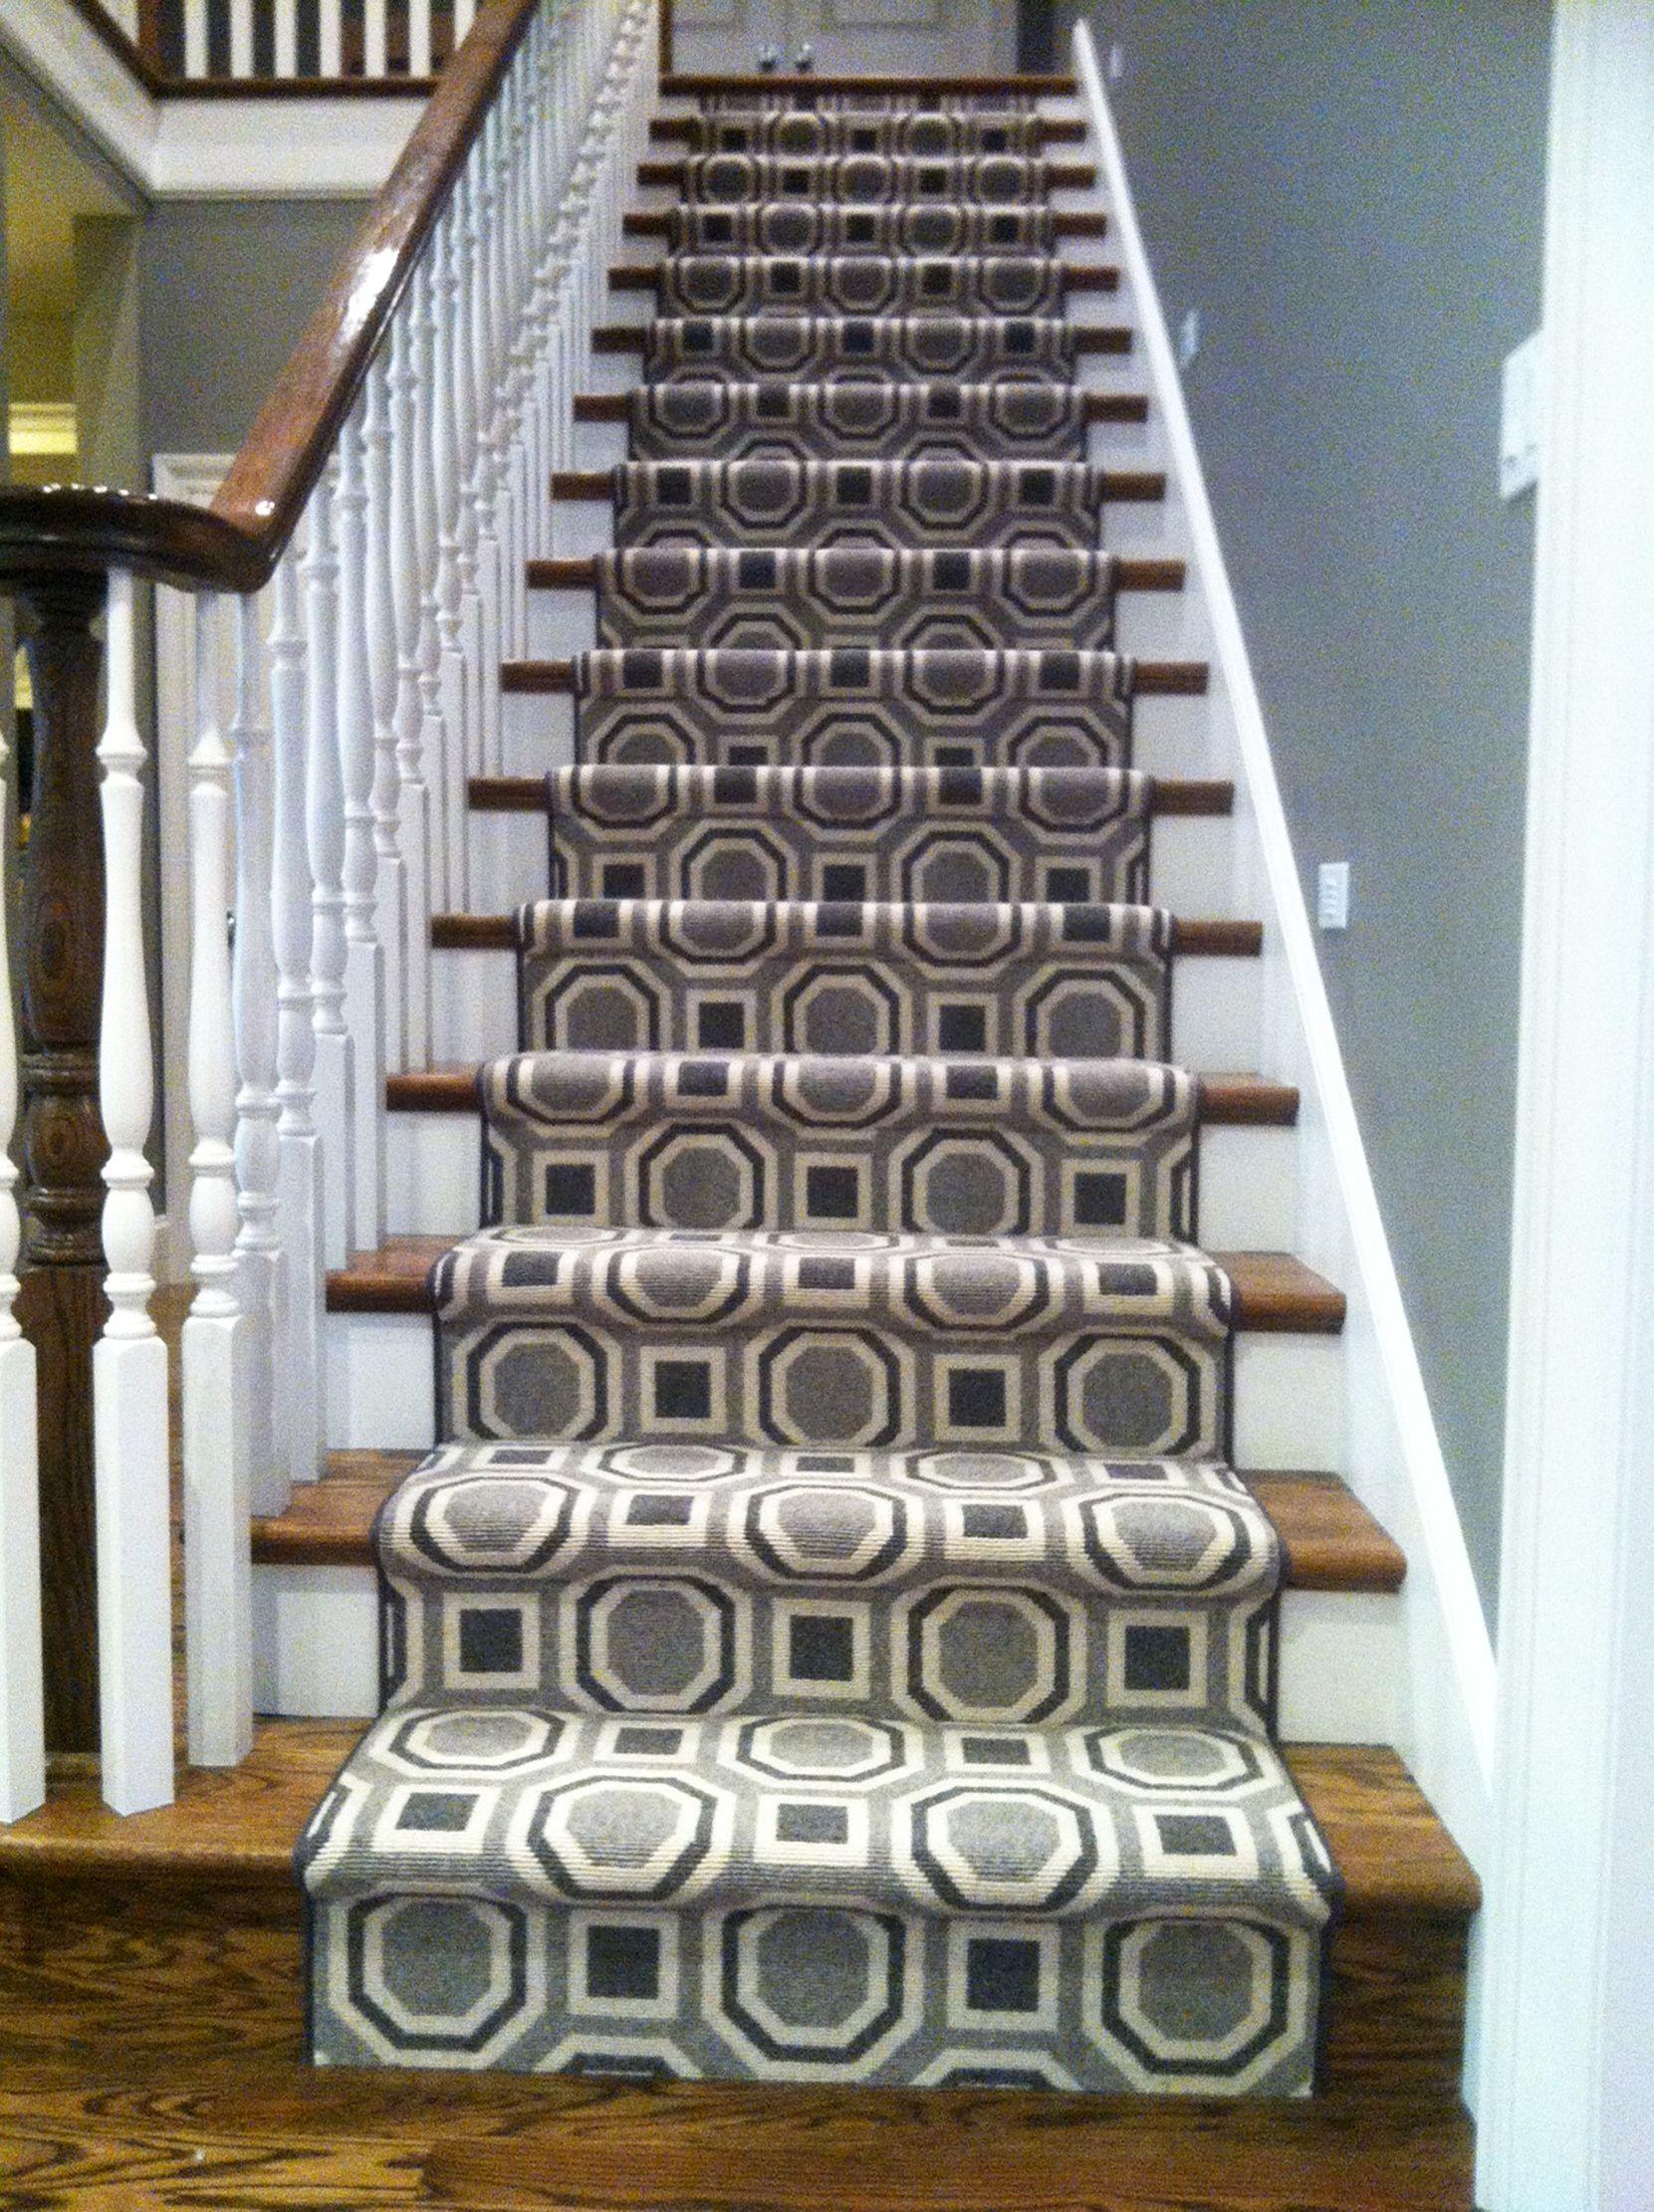 Genial Stark Carpet Stair Runner   Google Search Carpet Stair Runners, Carpet  Stairs, Carpet Ideas